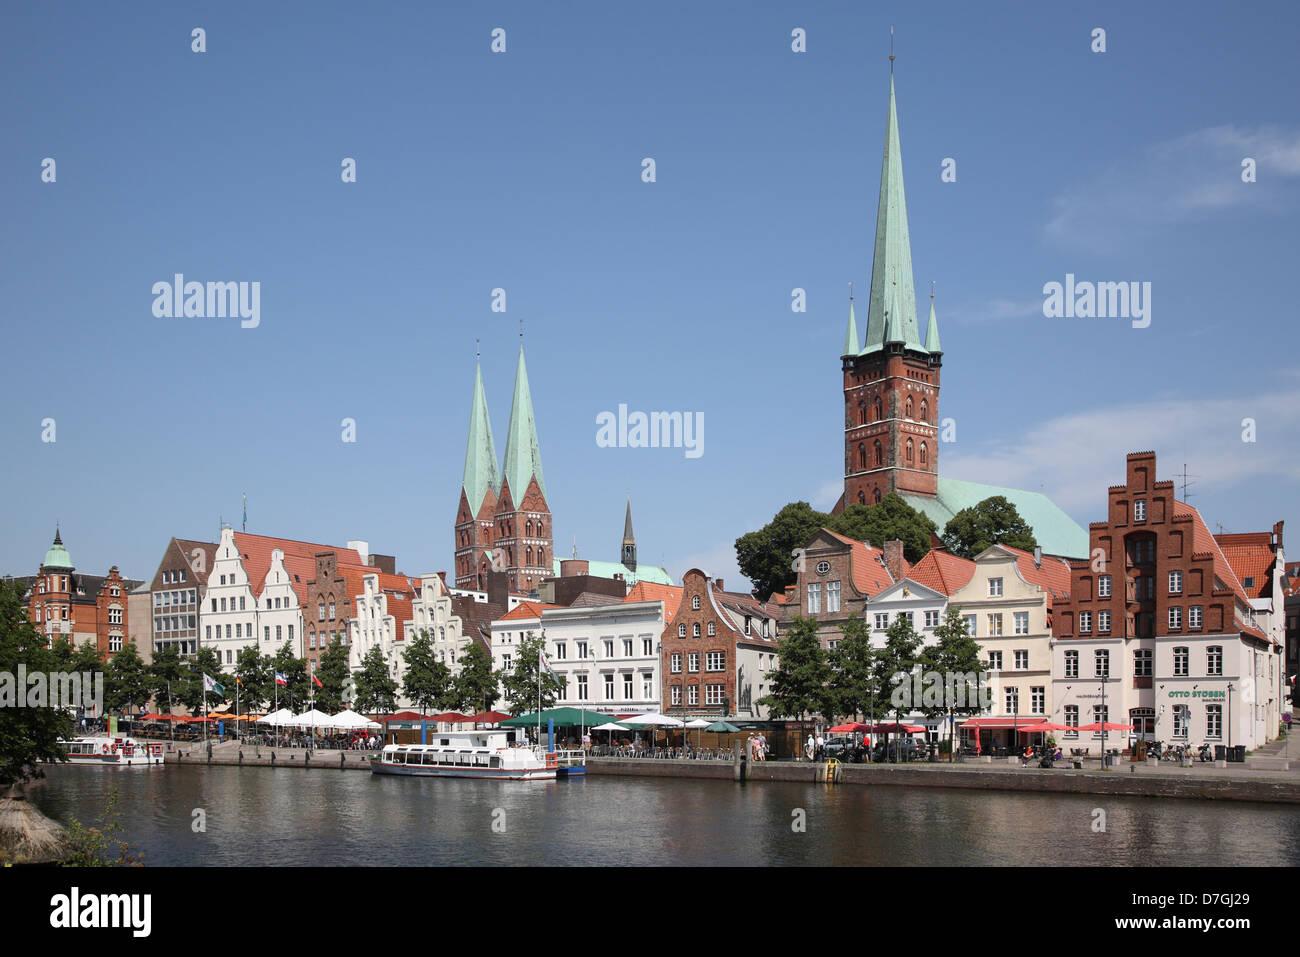 Lübeck Schleswig Holstein Trave River - Stock Image